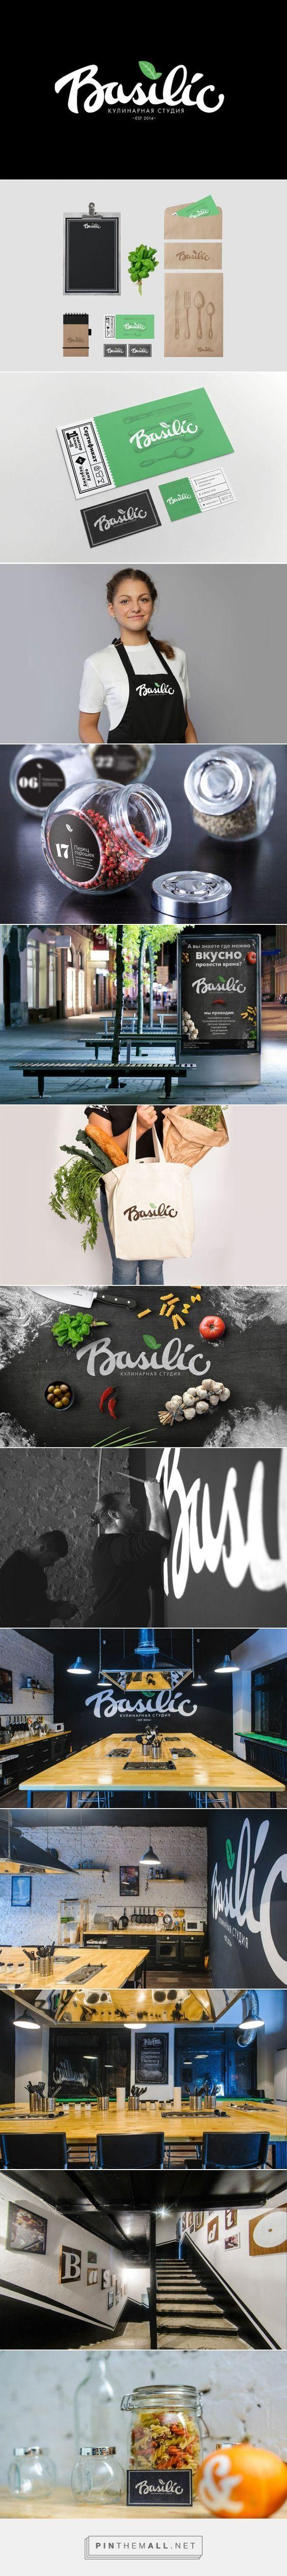 Basilic Branding by Stepan Solodkov | Fivestar Branding – Design and Branding Agency & Inspiration Gallery